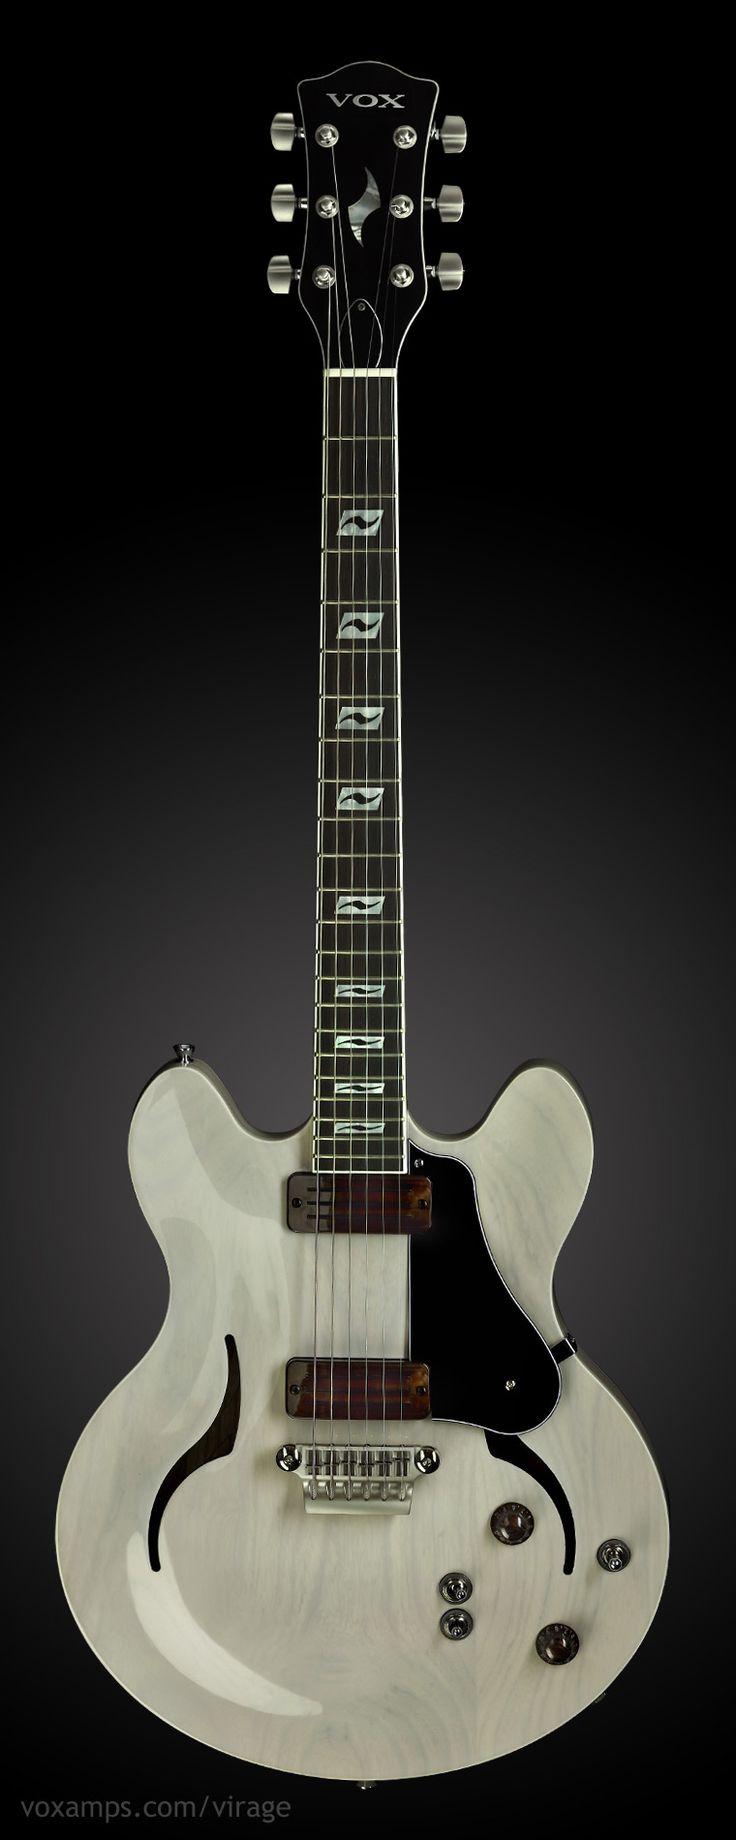 Vox Virage, Guitars